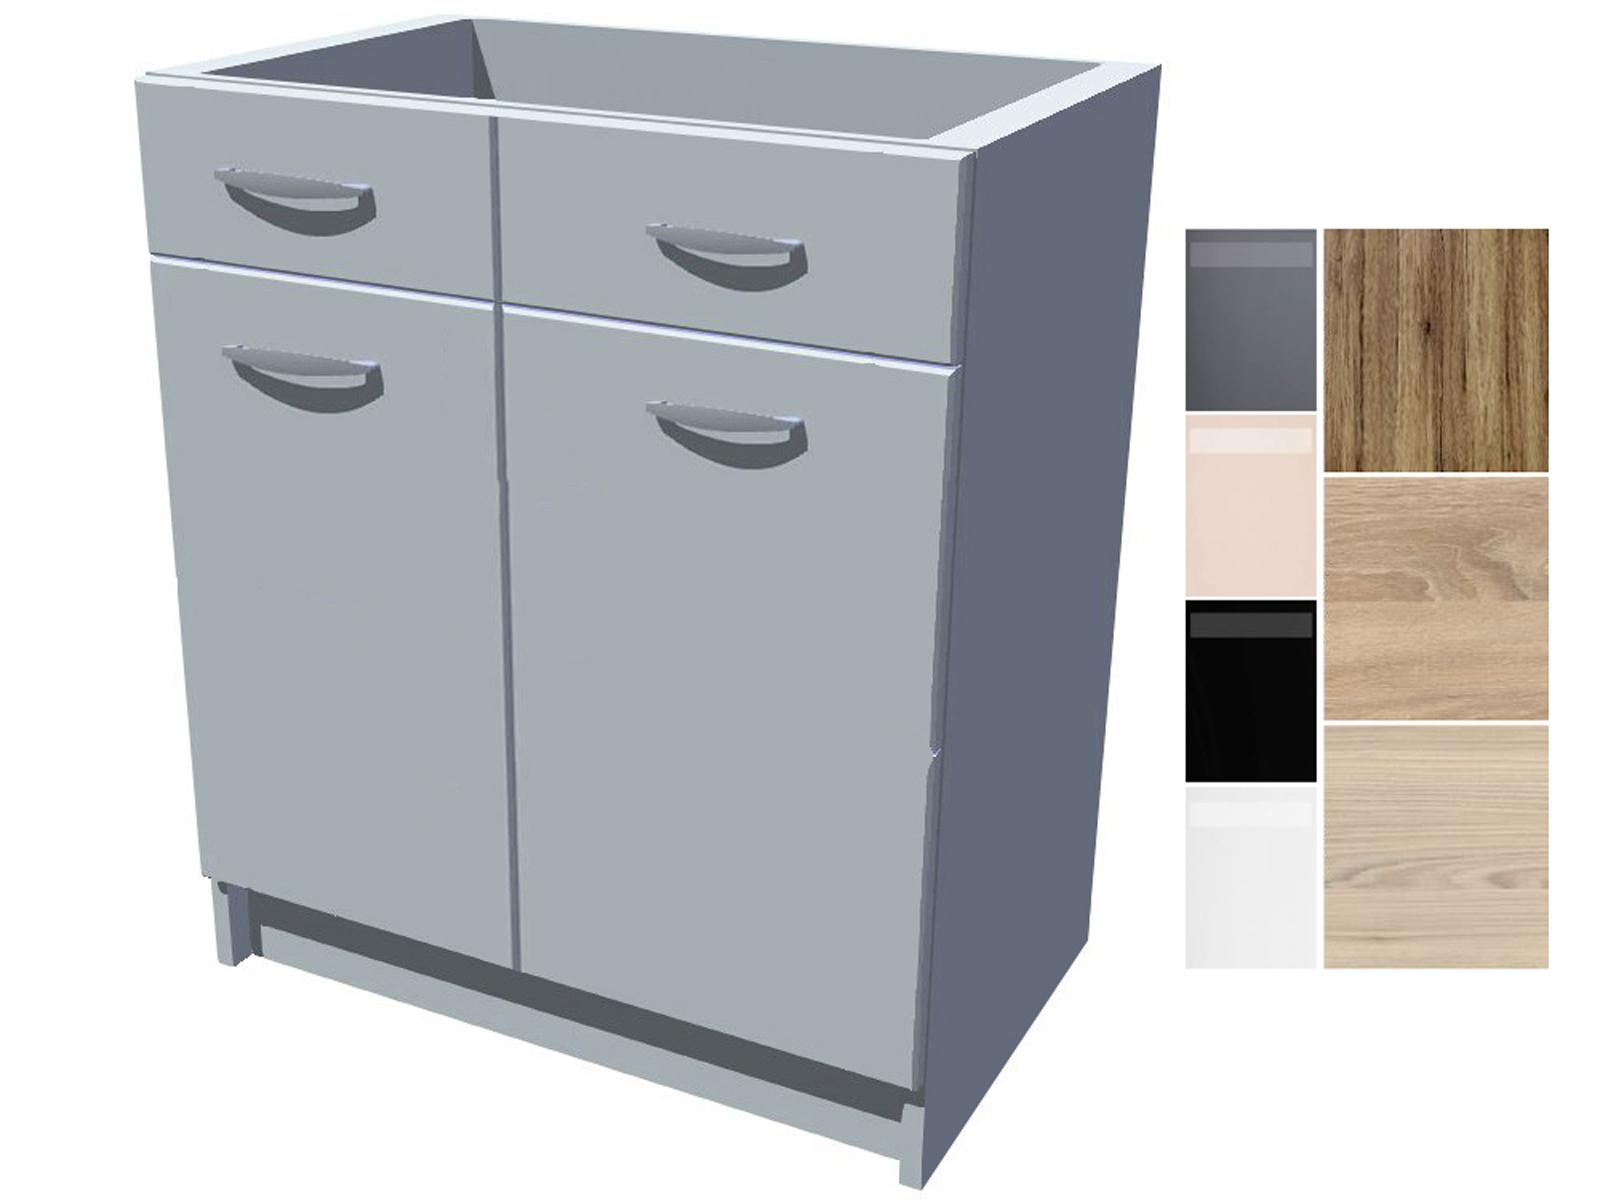 Dřezová kuchyňská skříňka Iga 2D 70 cm